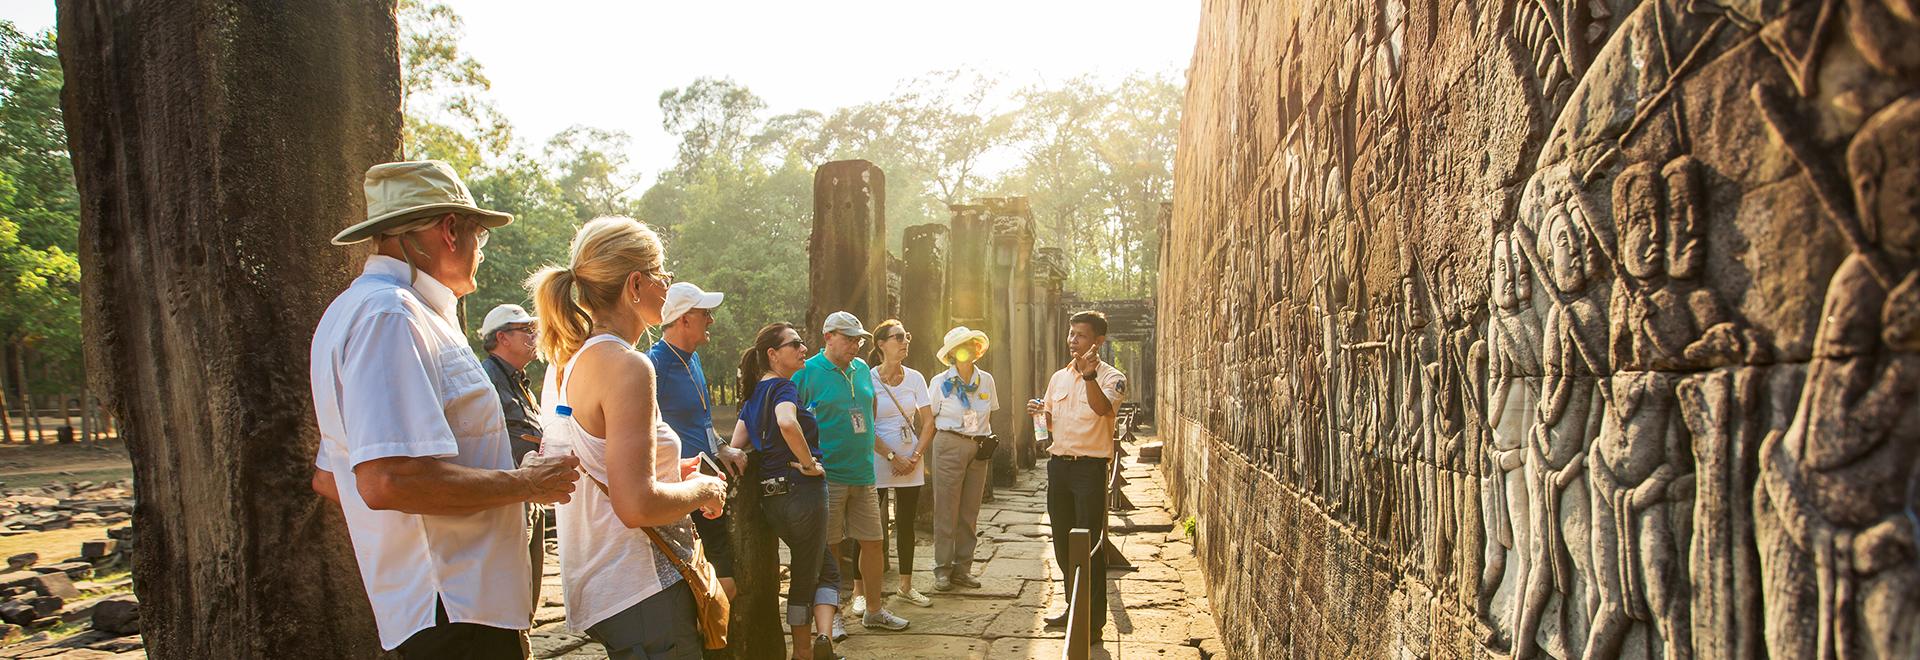 Asia-Cambodia-Angkor-WAt-SGJ-MH.jpg